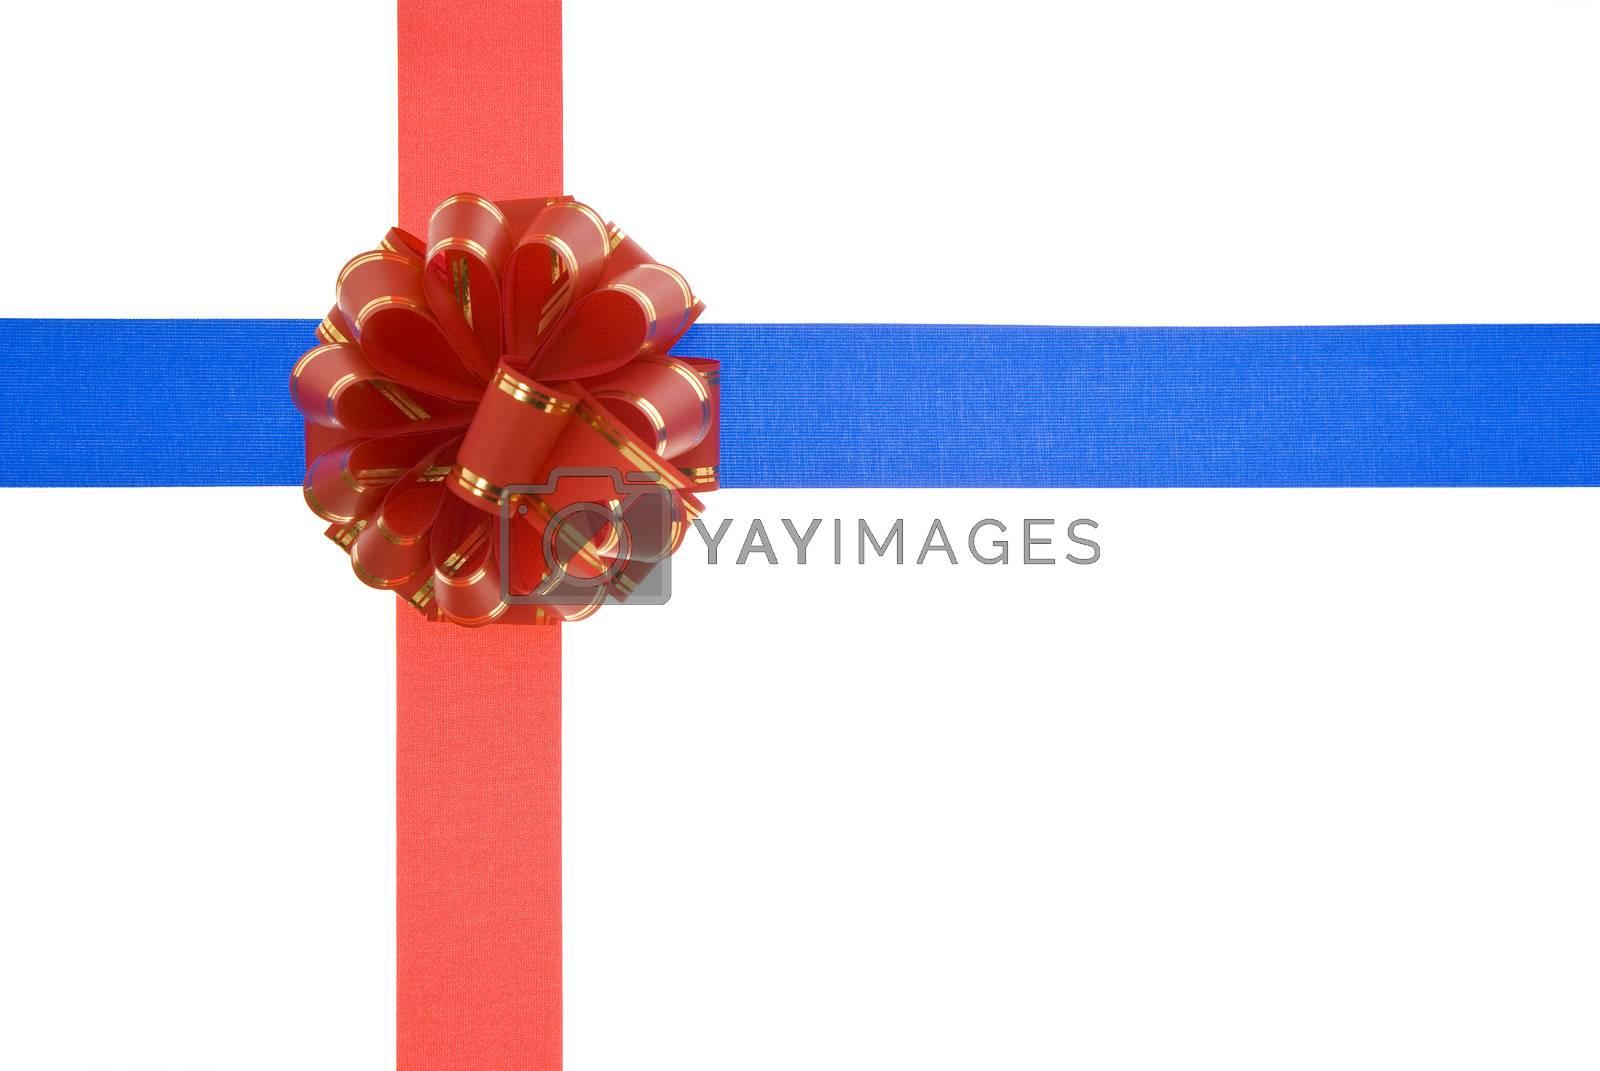 Royalty free image of gift ribbon by dabjola